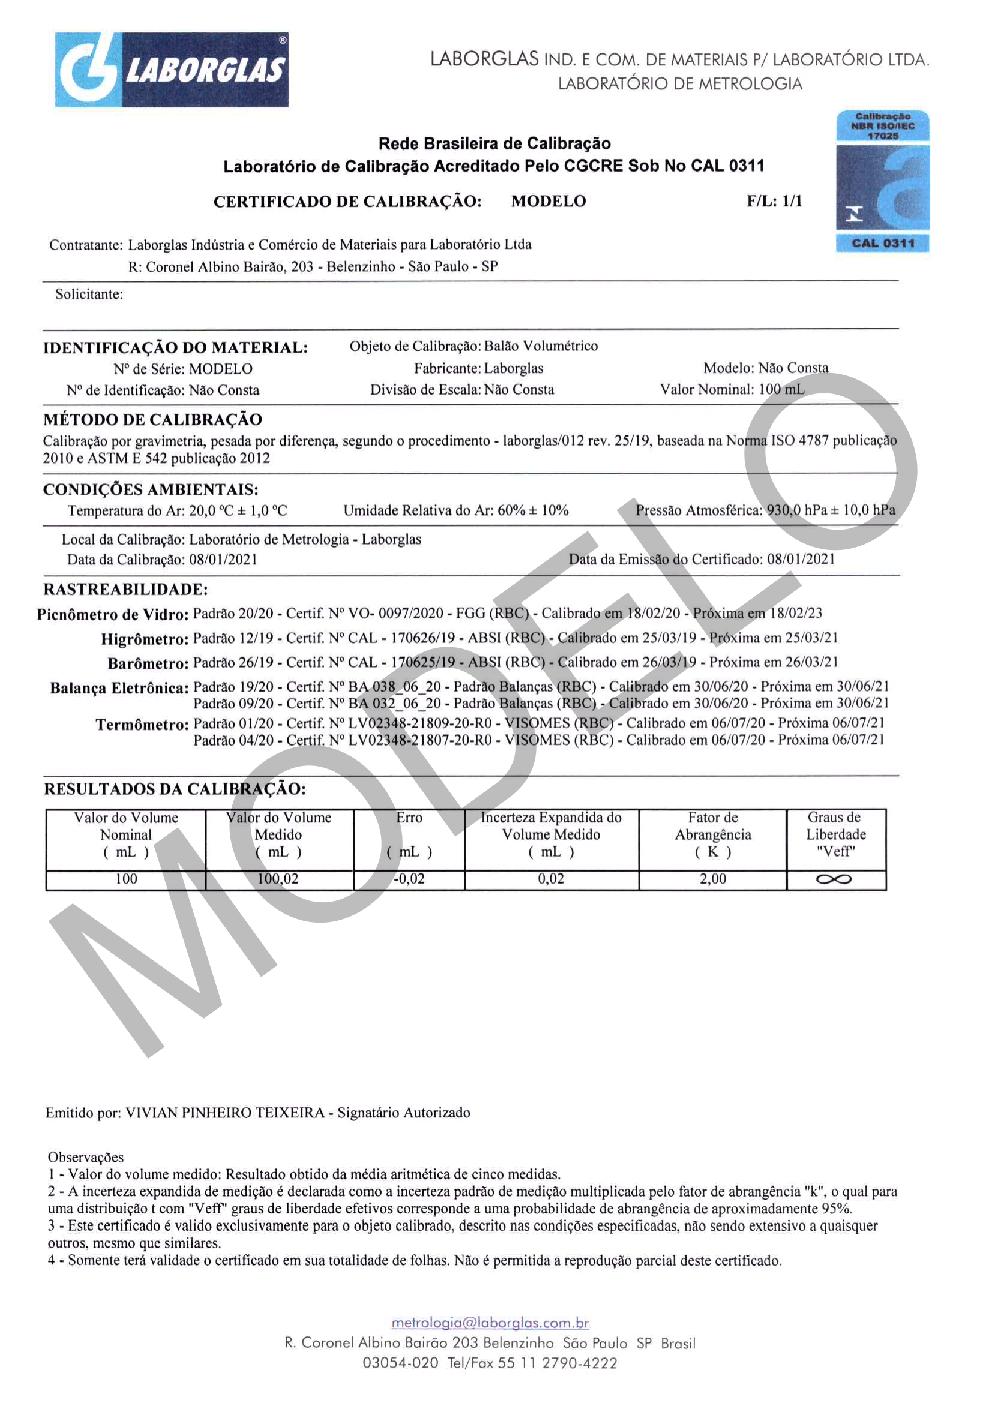 BALÃO VOLUMÉTRICO CLASSE A ROLHA POLI C/ CERTIFICADO RBC 200 ML - Marca Laborglas - Cód. 9167832-R